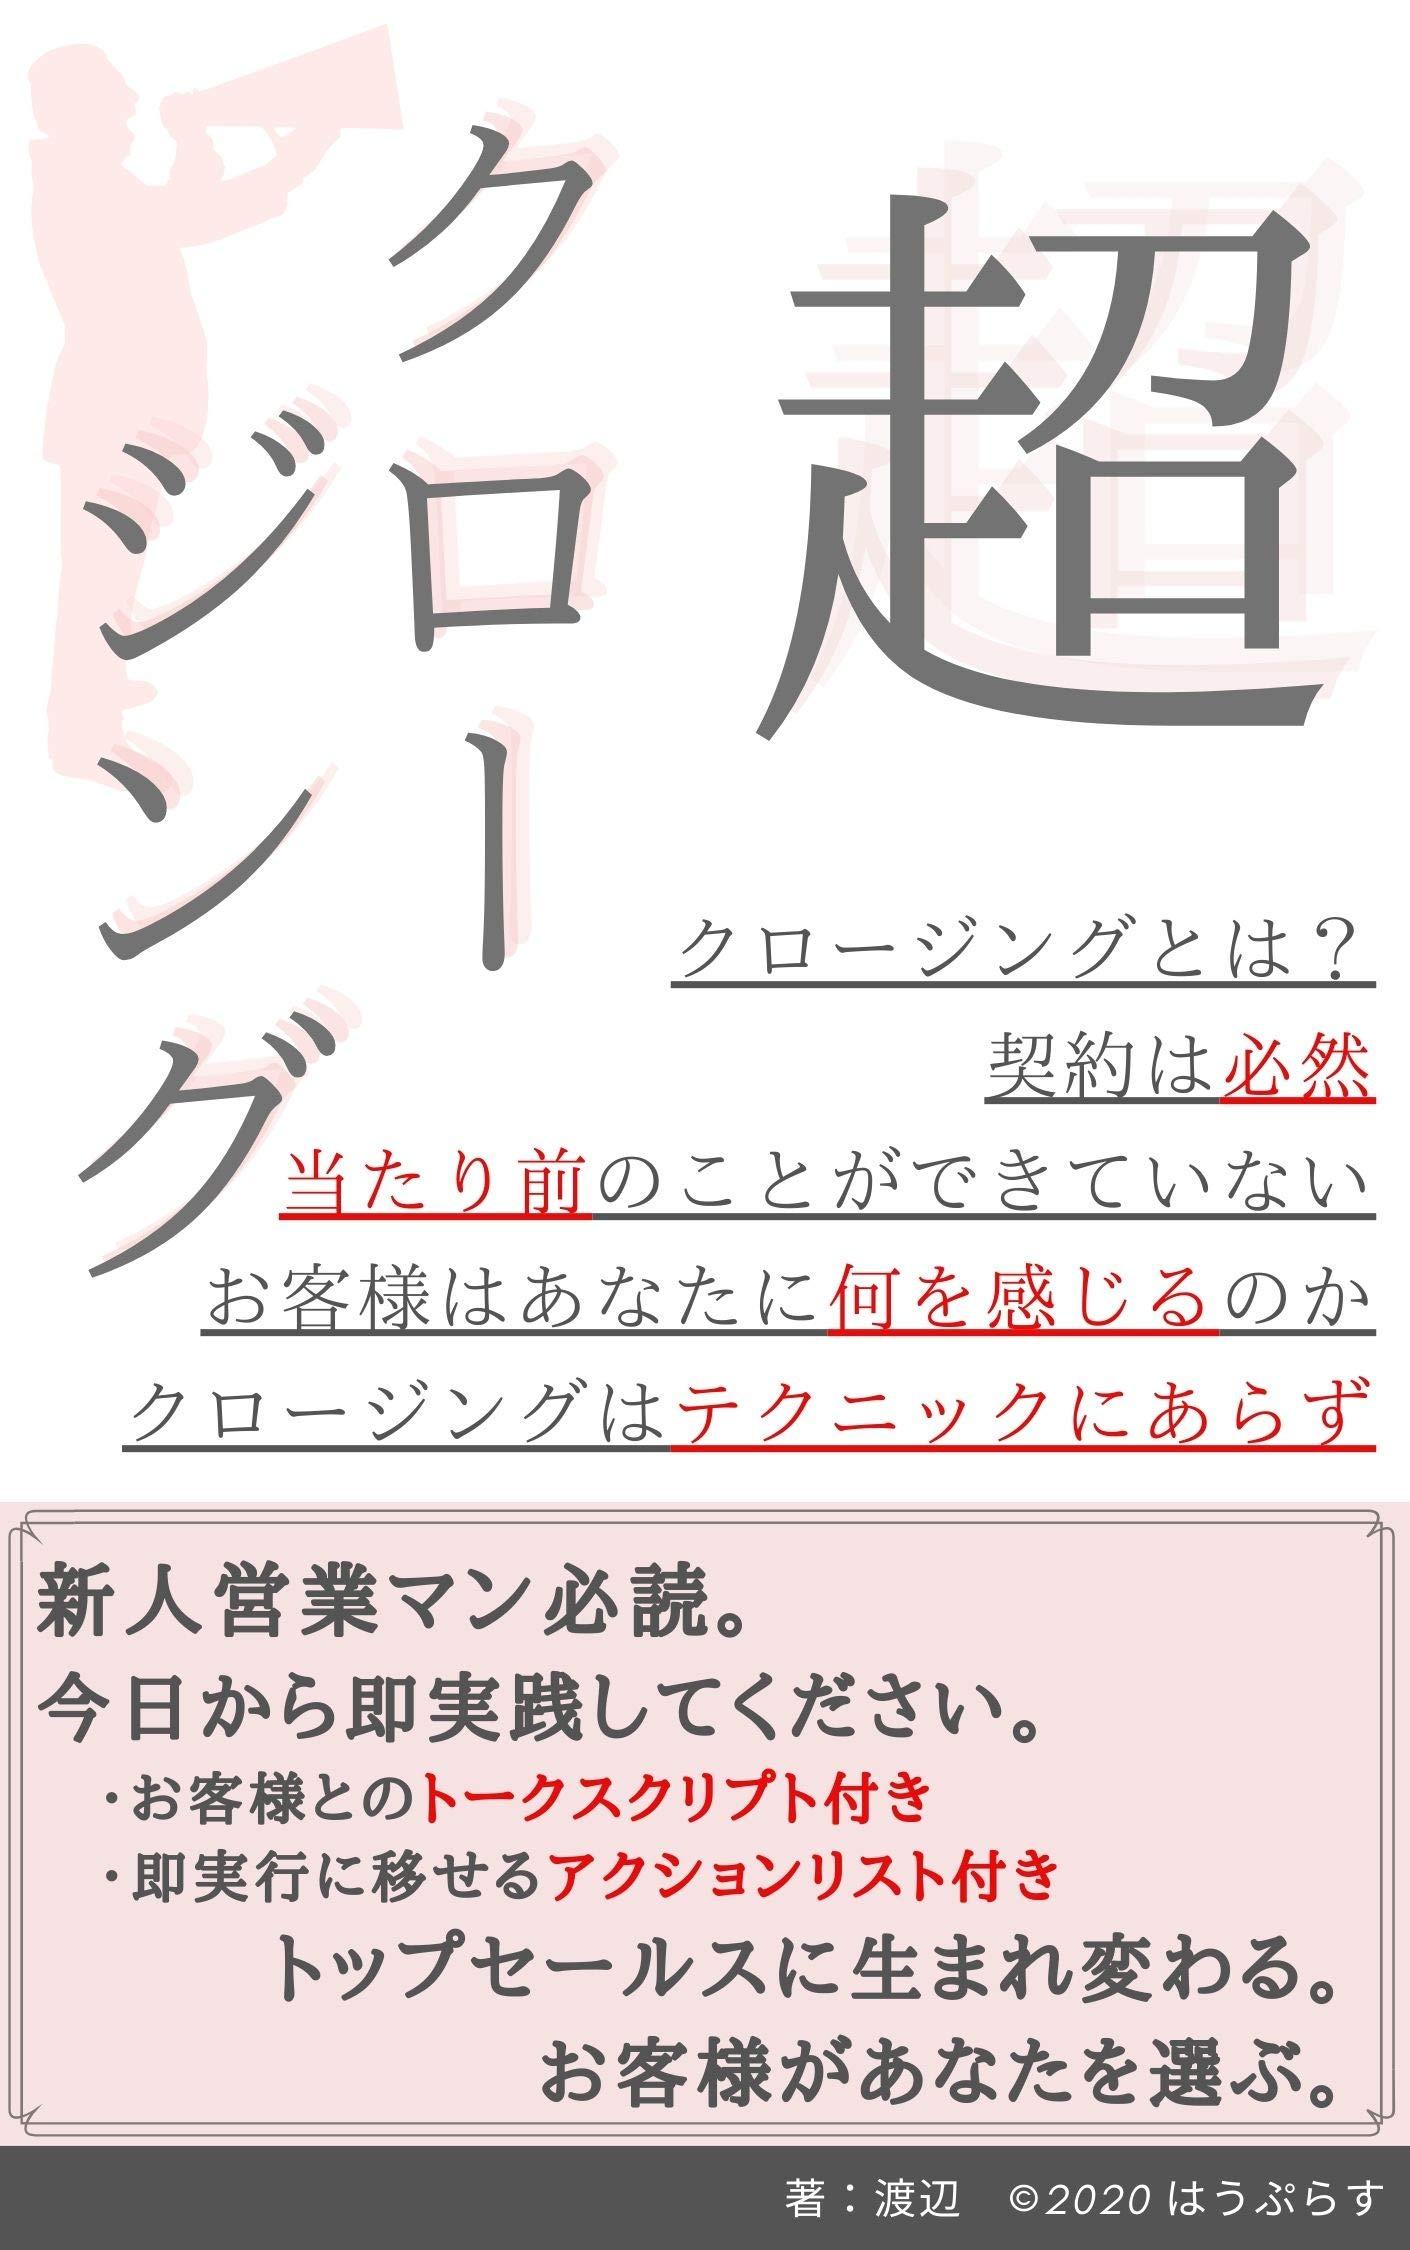 tyoukurojingu: eigyoumannhitudokunosyo okyakusamagaanatawoerabu (Japanese Edition)